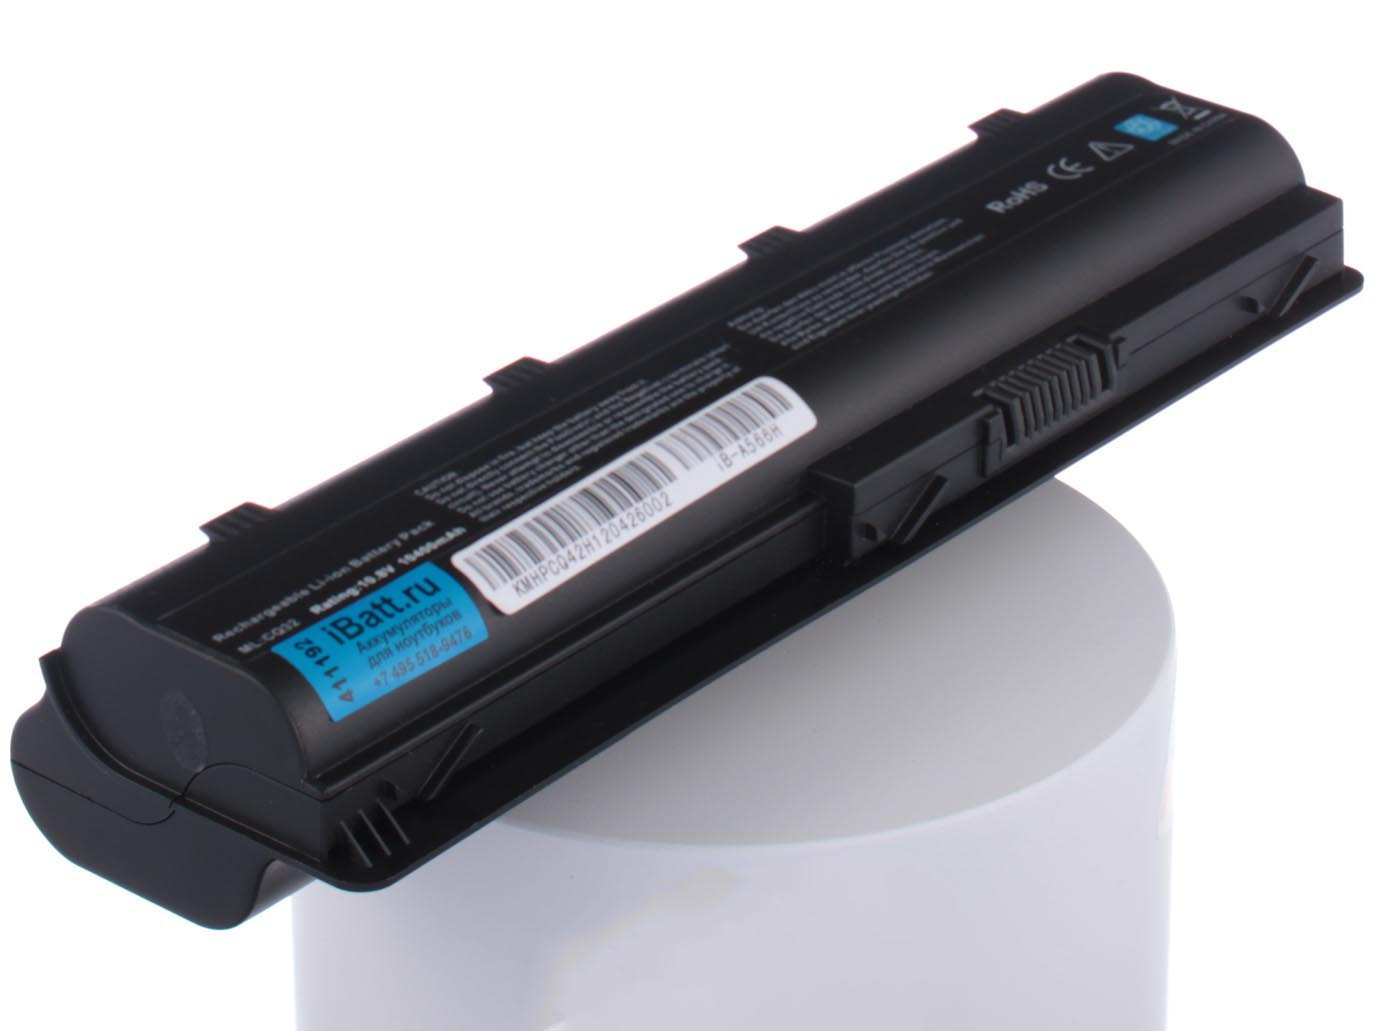 цена на Аккумулятор для ноутбука iBatt для HP-Compaq Pavilion dv7-6b52er, Pavilion dv7-6b54er, Pavilion g6-2205sr, Pavilion g6-1259er, Pavilion g6-1124er, 2000-2d52SR, Pavilion g6-1109er, Pavilion g7-2256sr, G62-a82ER